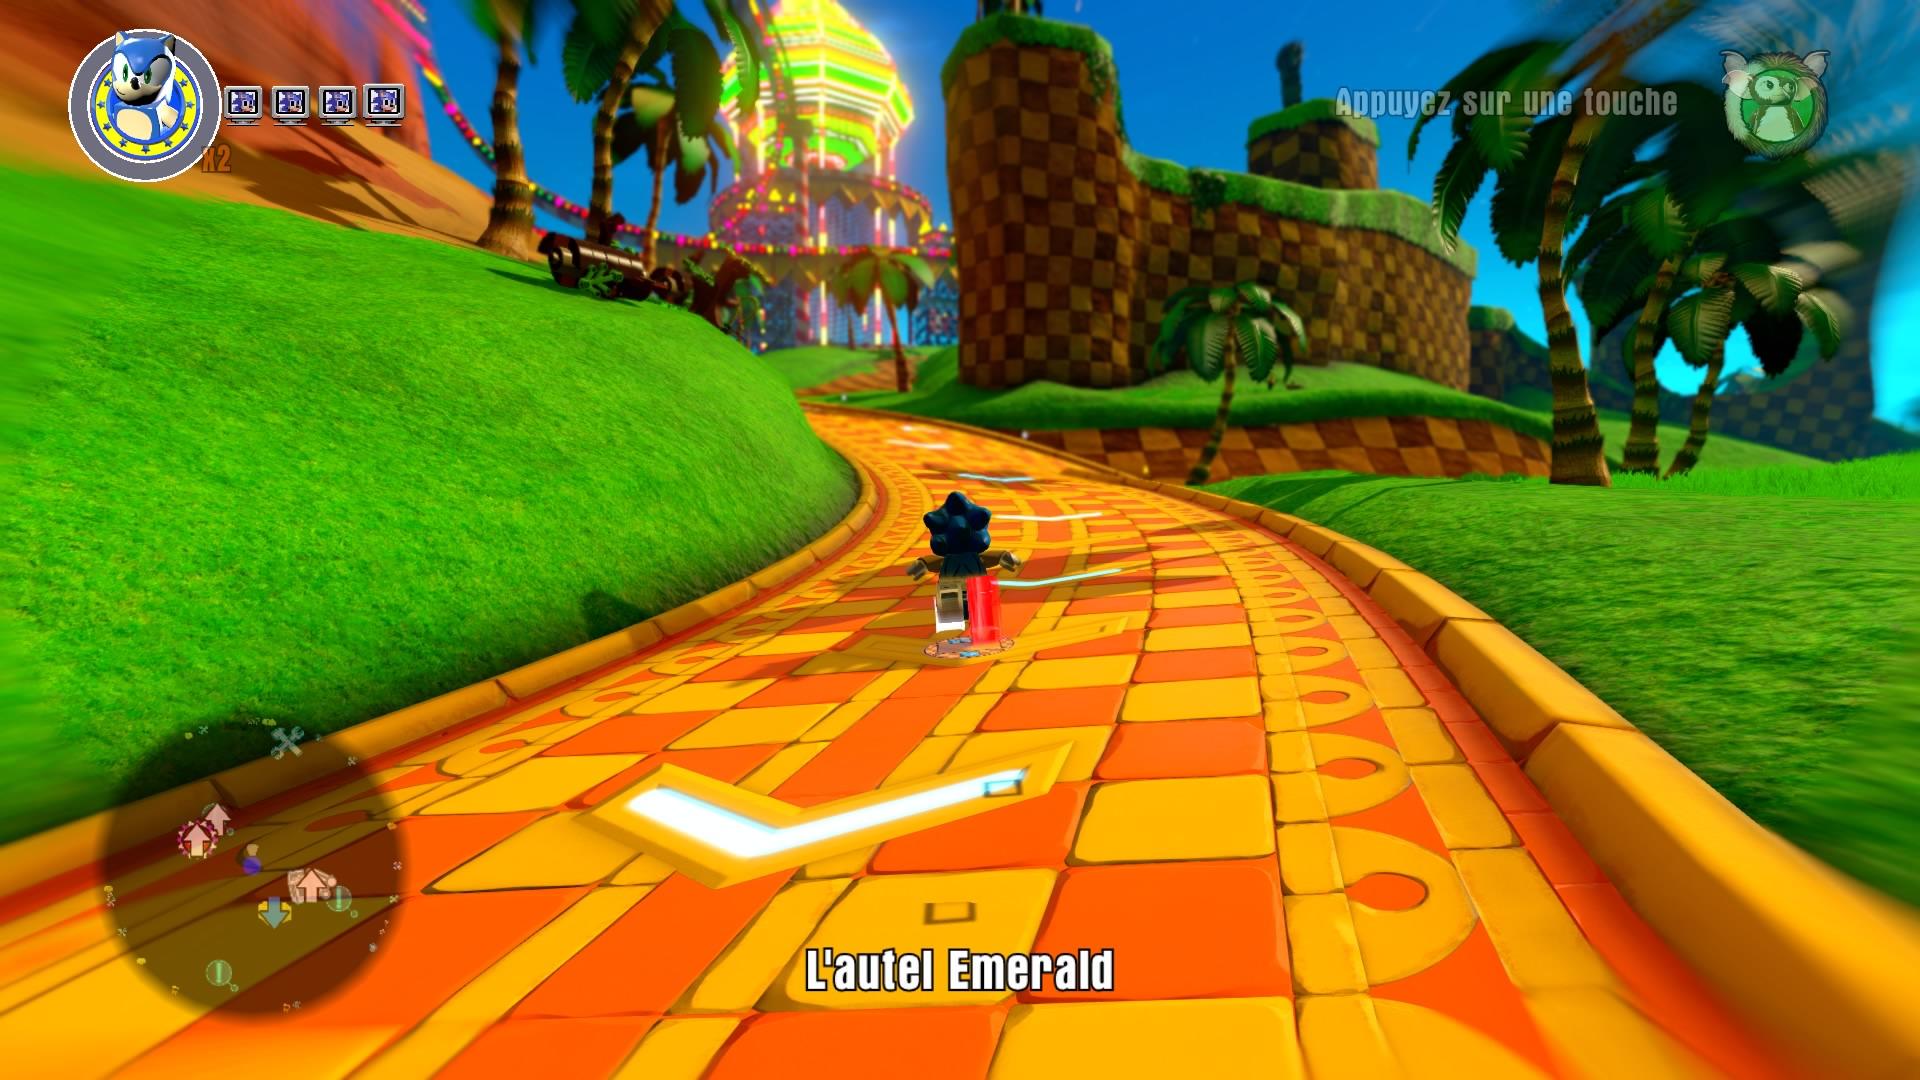 LEGODimensions-SonicTheHedgehogLevelPack PS4 Test 033